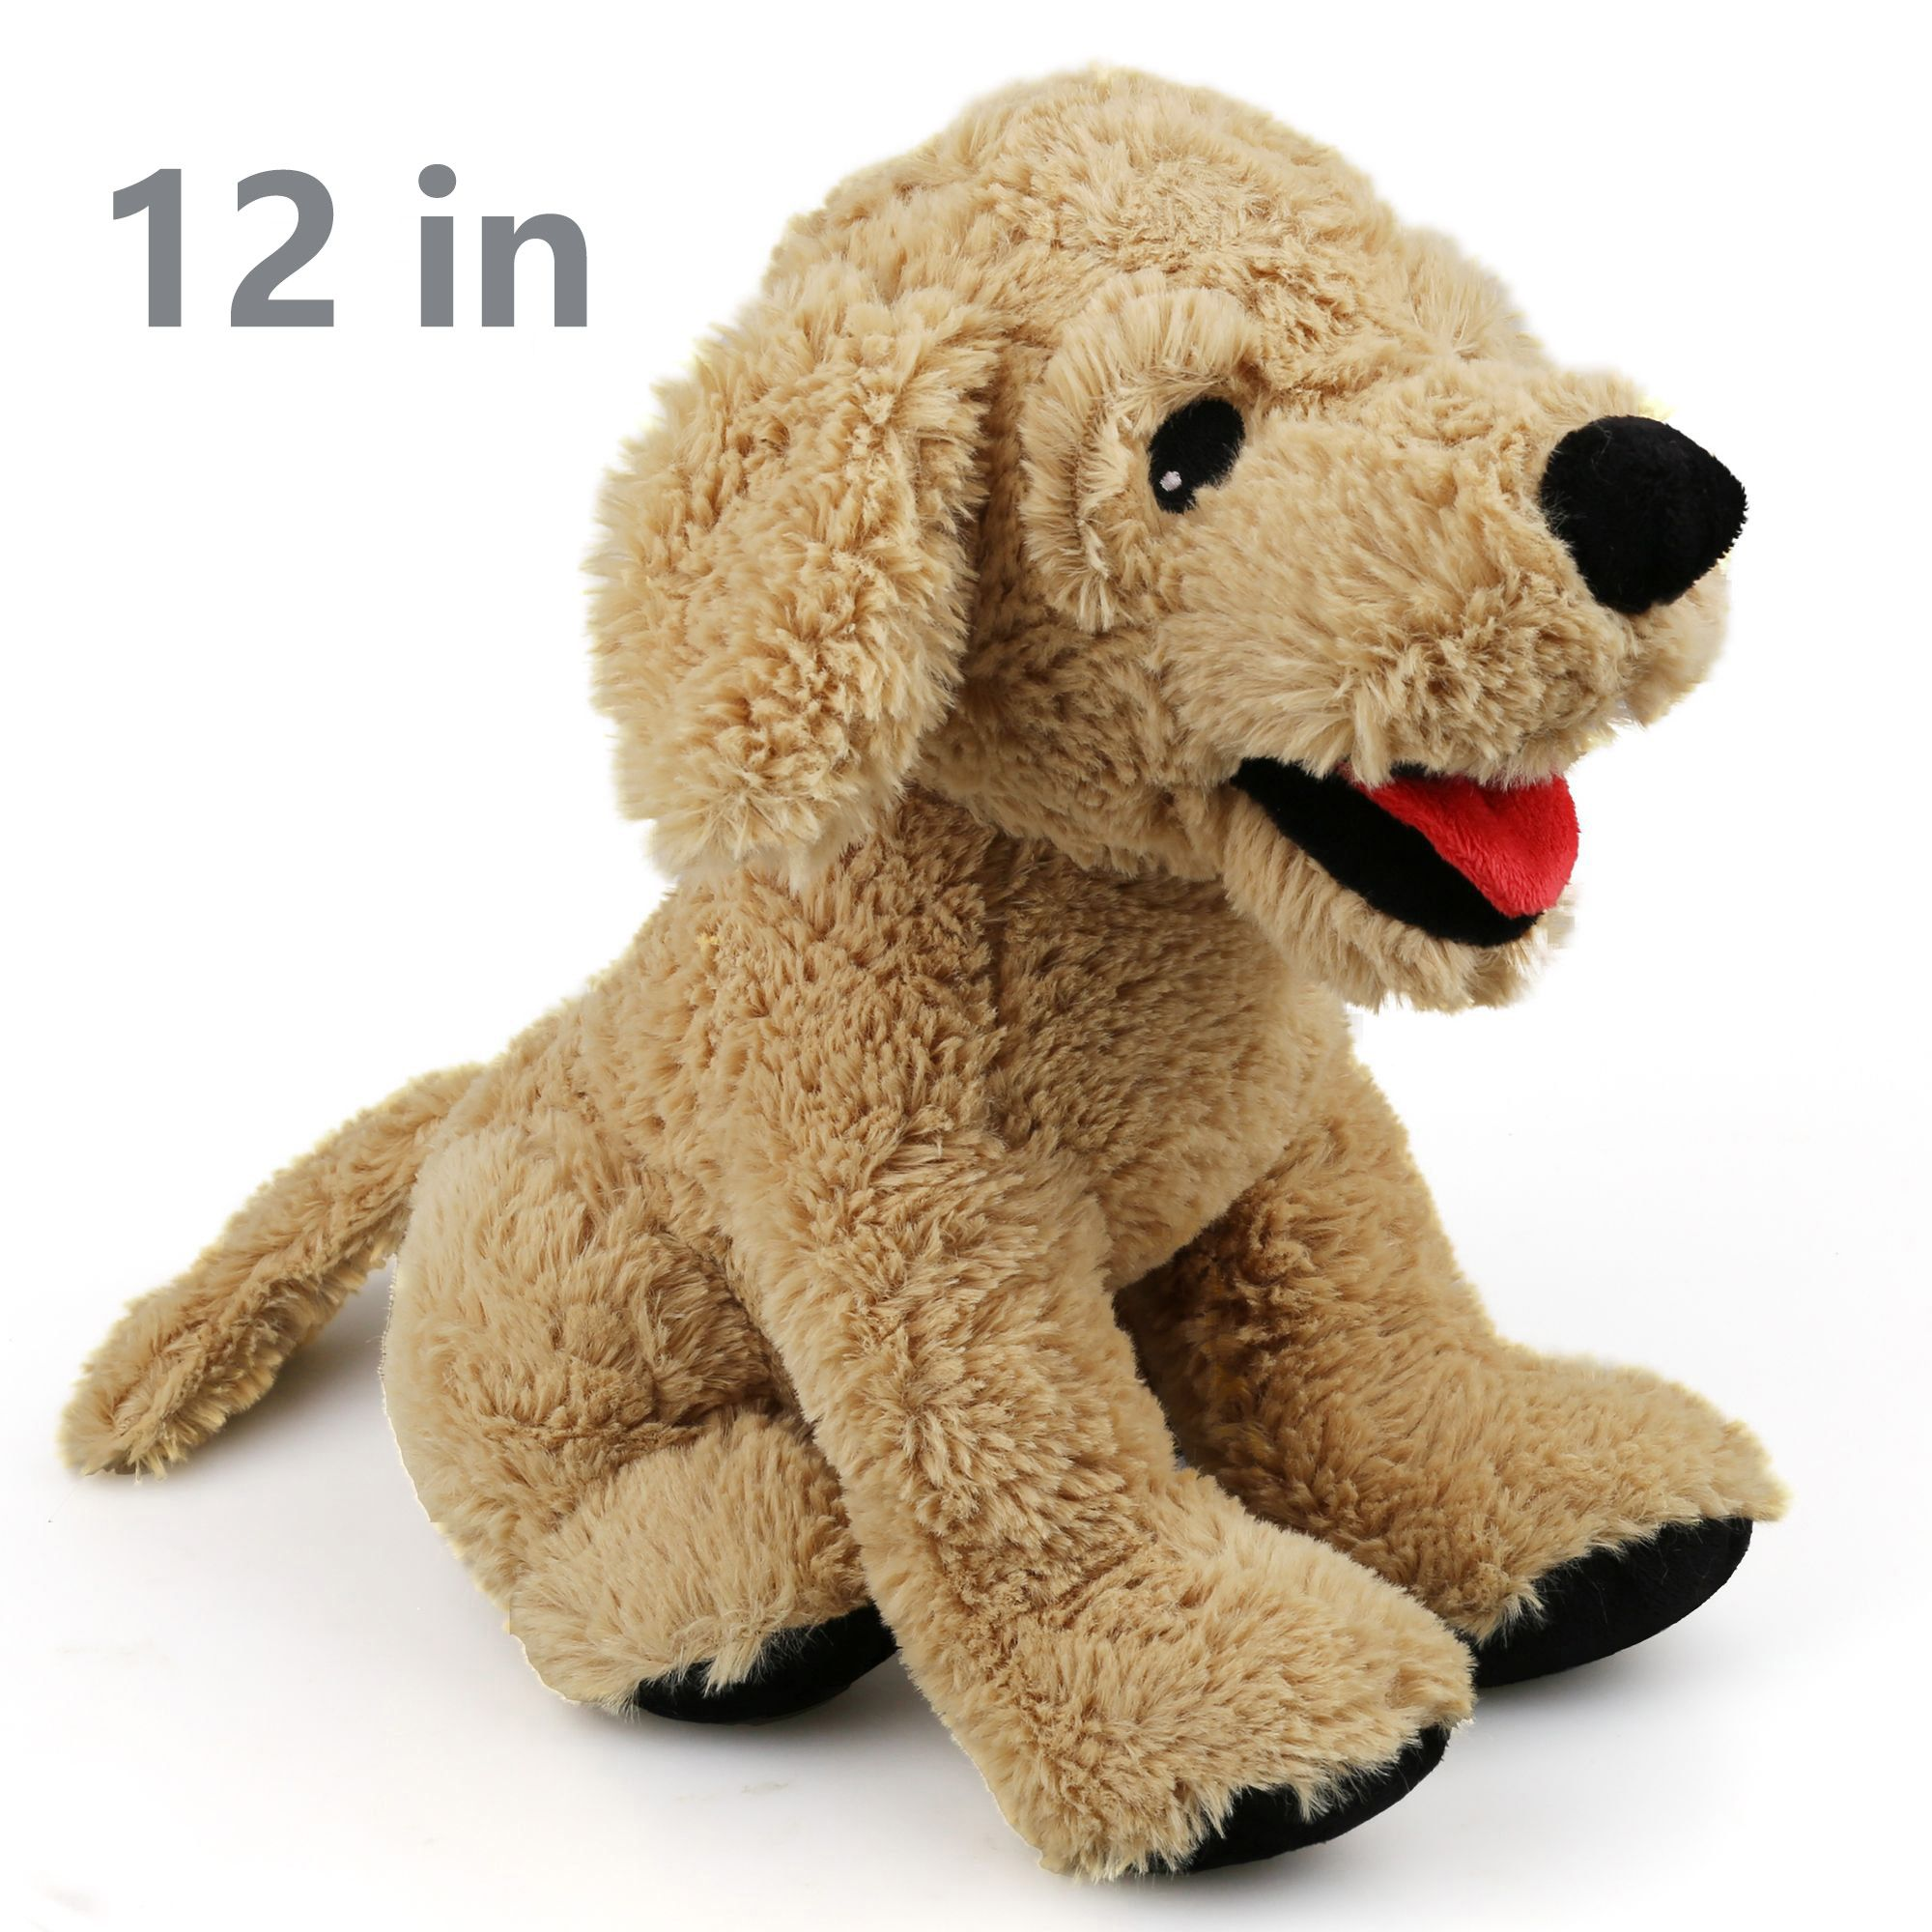 Dog Stuffed Animals, 12 inches Soft Cuddly Golden